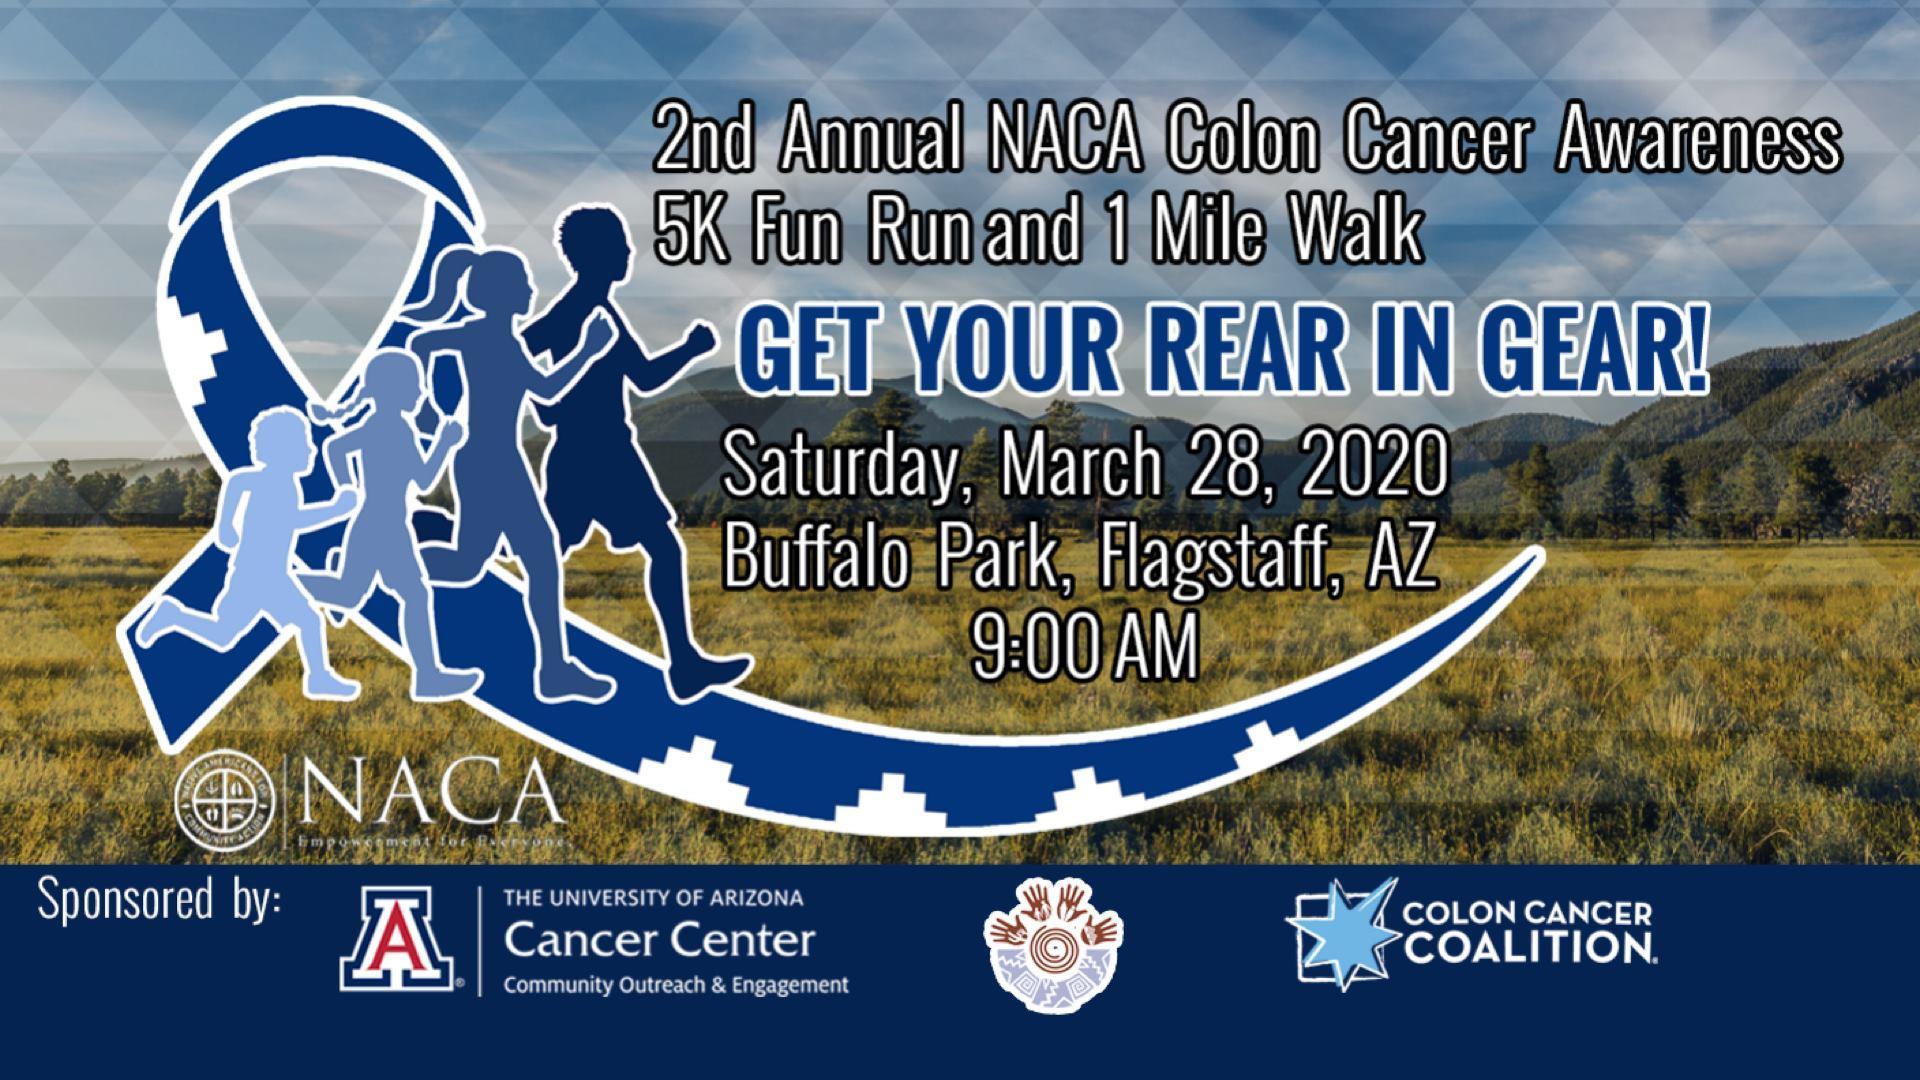 2nd Annual Naca Colon Cancer 5k Run 1 Mile Walk Get Your Rear 28 Mar 2020